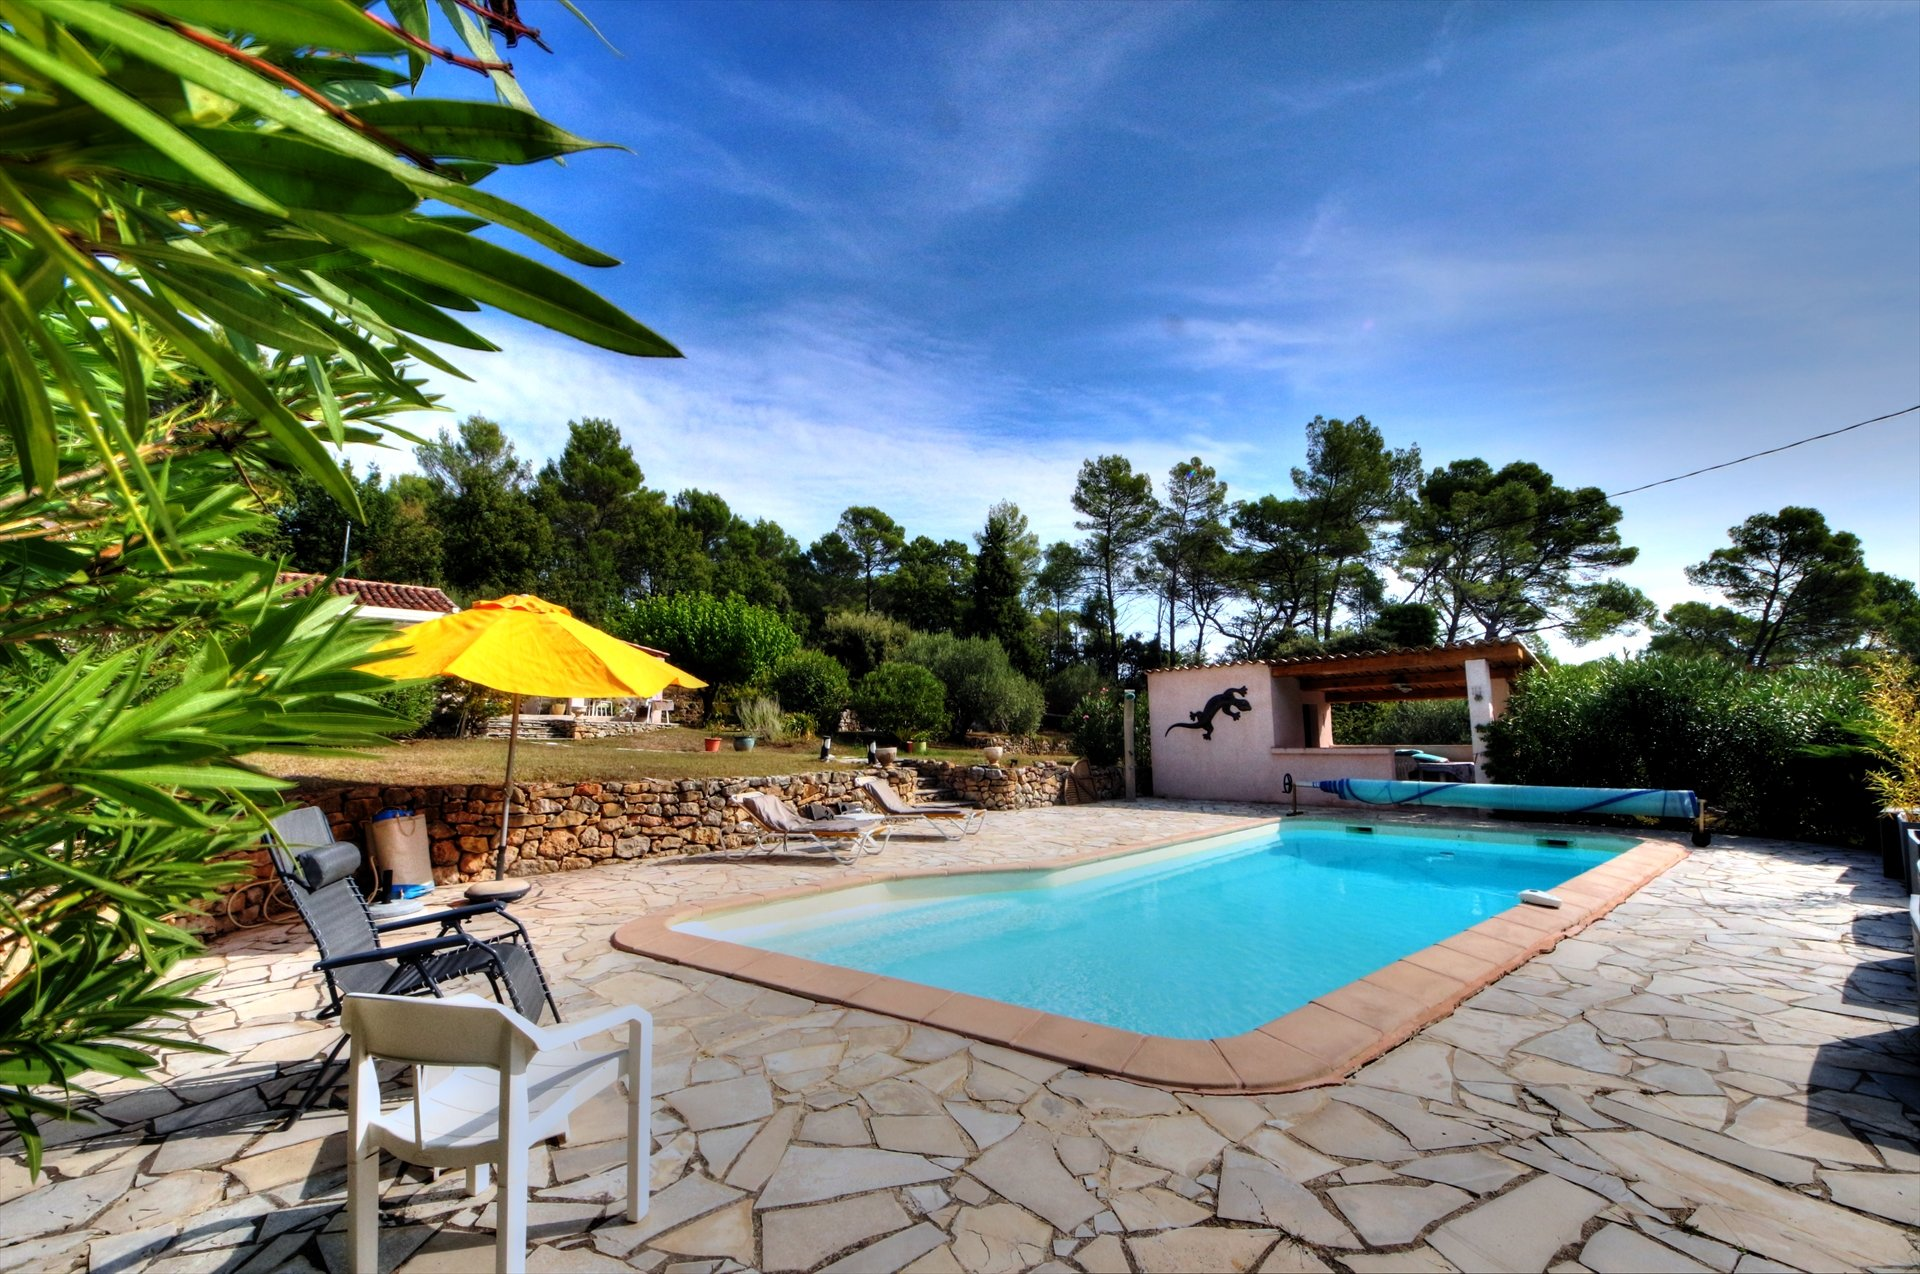 Salernes, quiétude et campagne, joli bastidon avec piscine